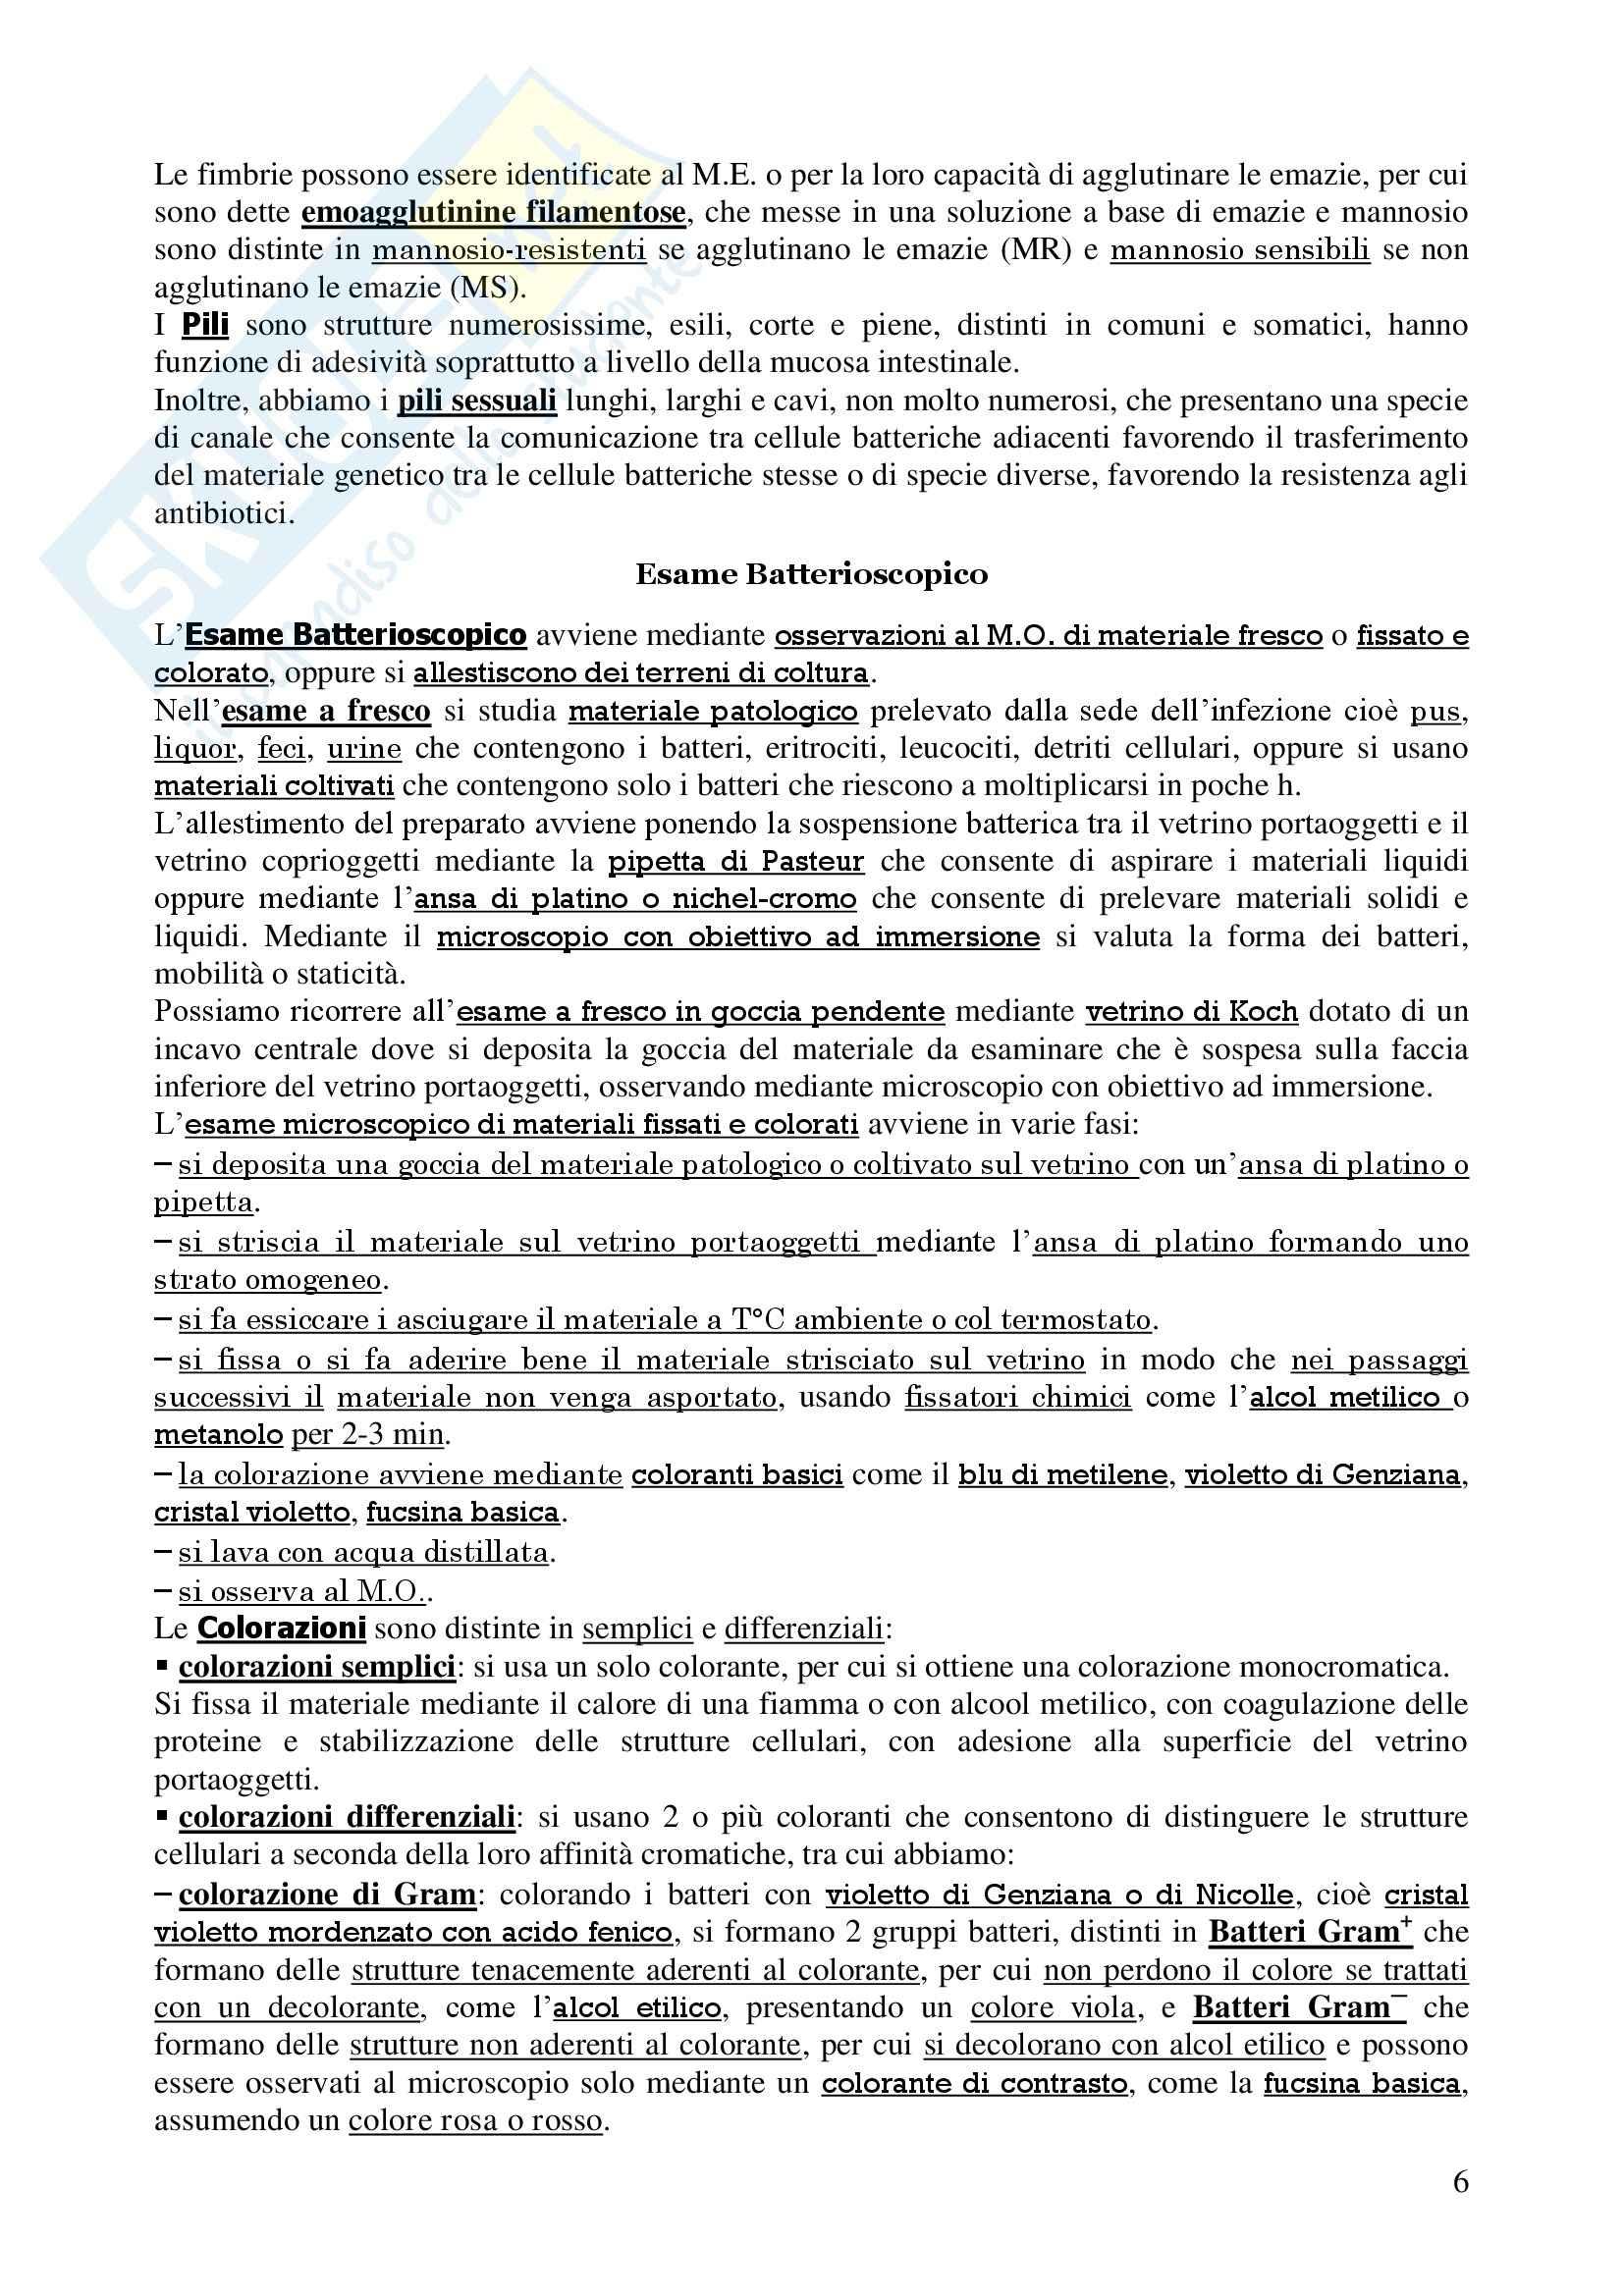 Microbiologia I e II - Corso completo Pag. 6